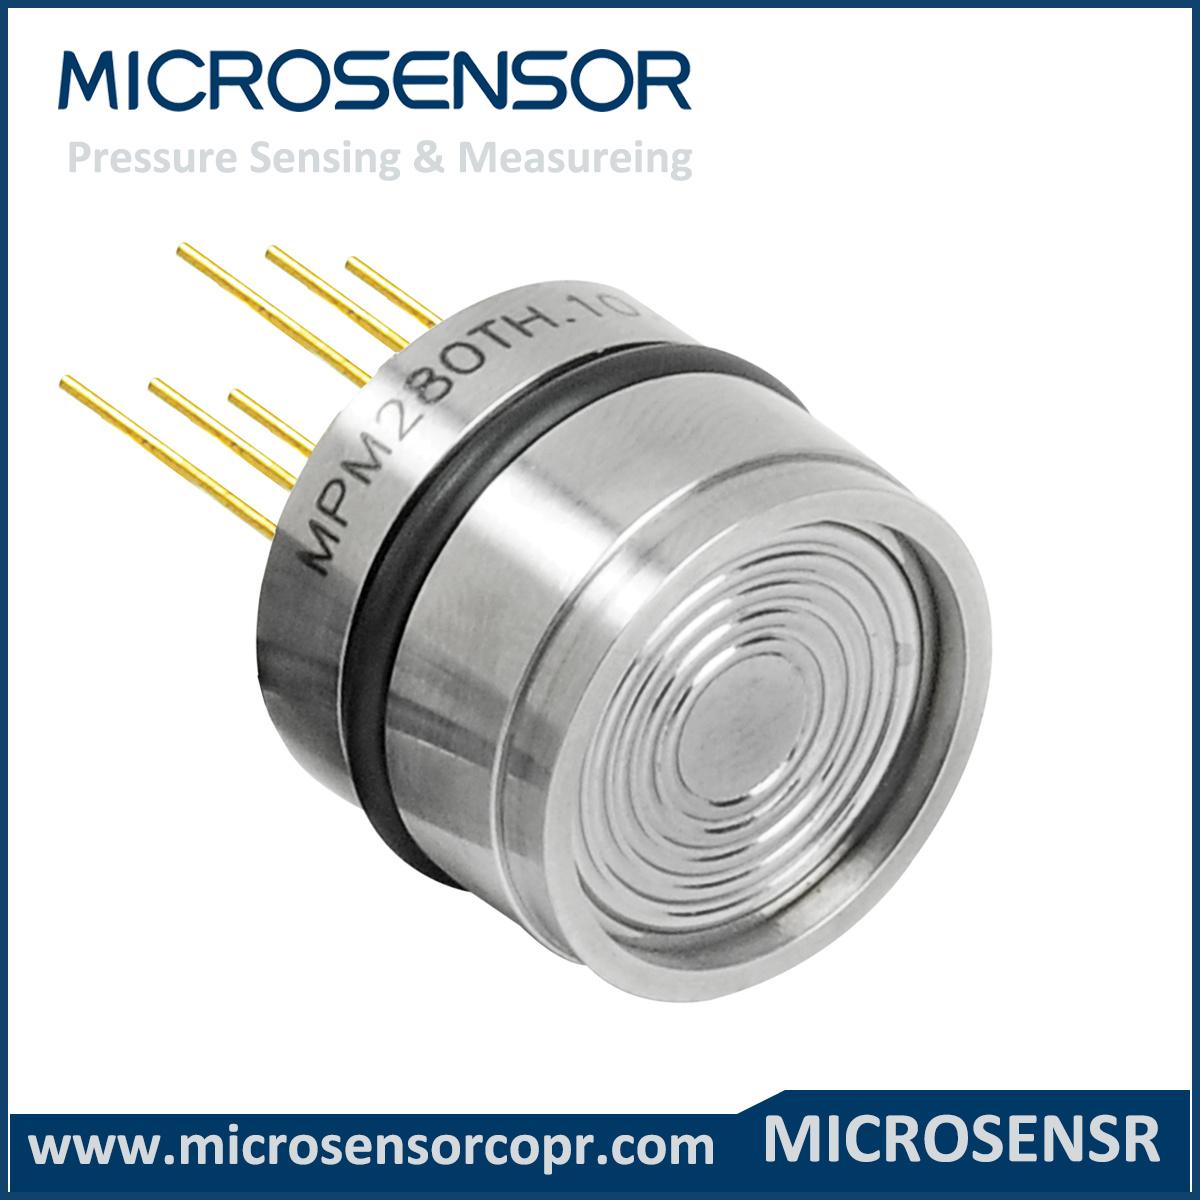 Anti-Corrosive Piezoresistive OEM Pressure Sensor Mpm280